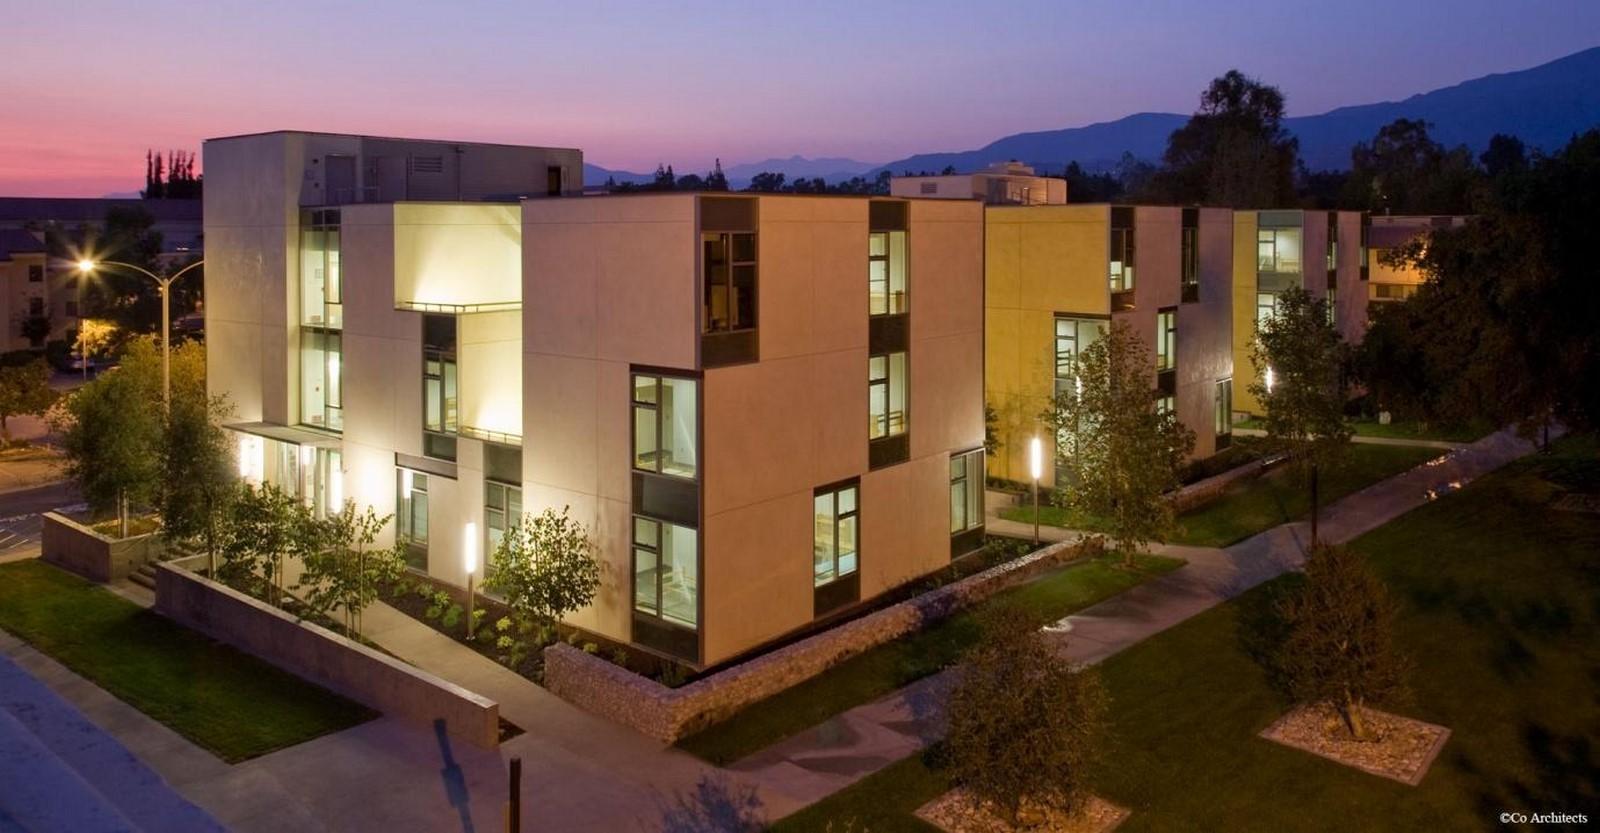 Claremont McKenna College Residence Hall, California- sheet1